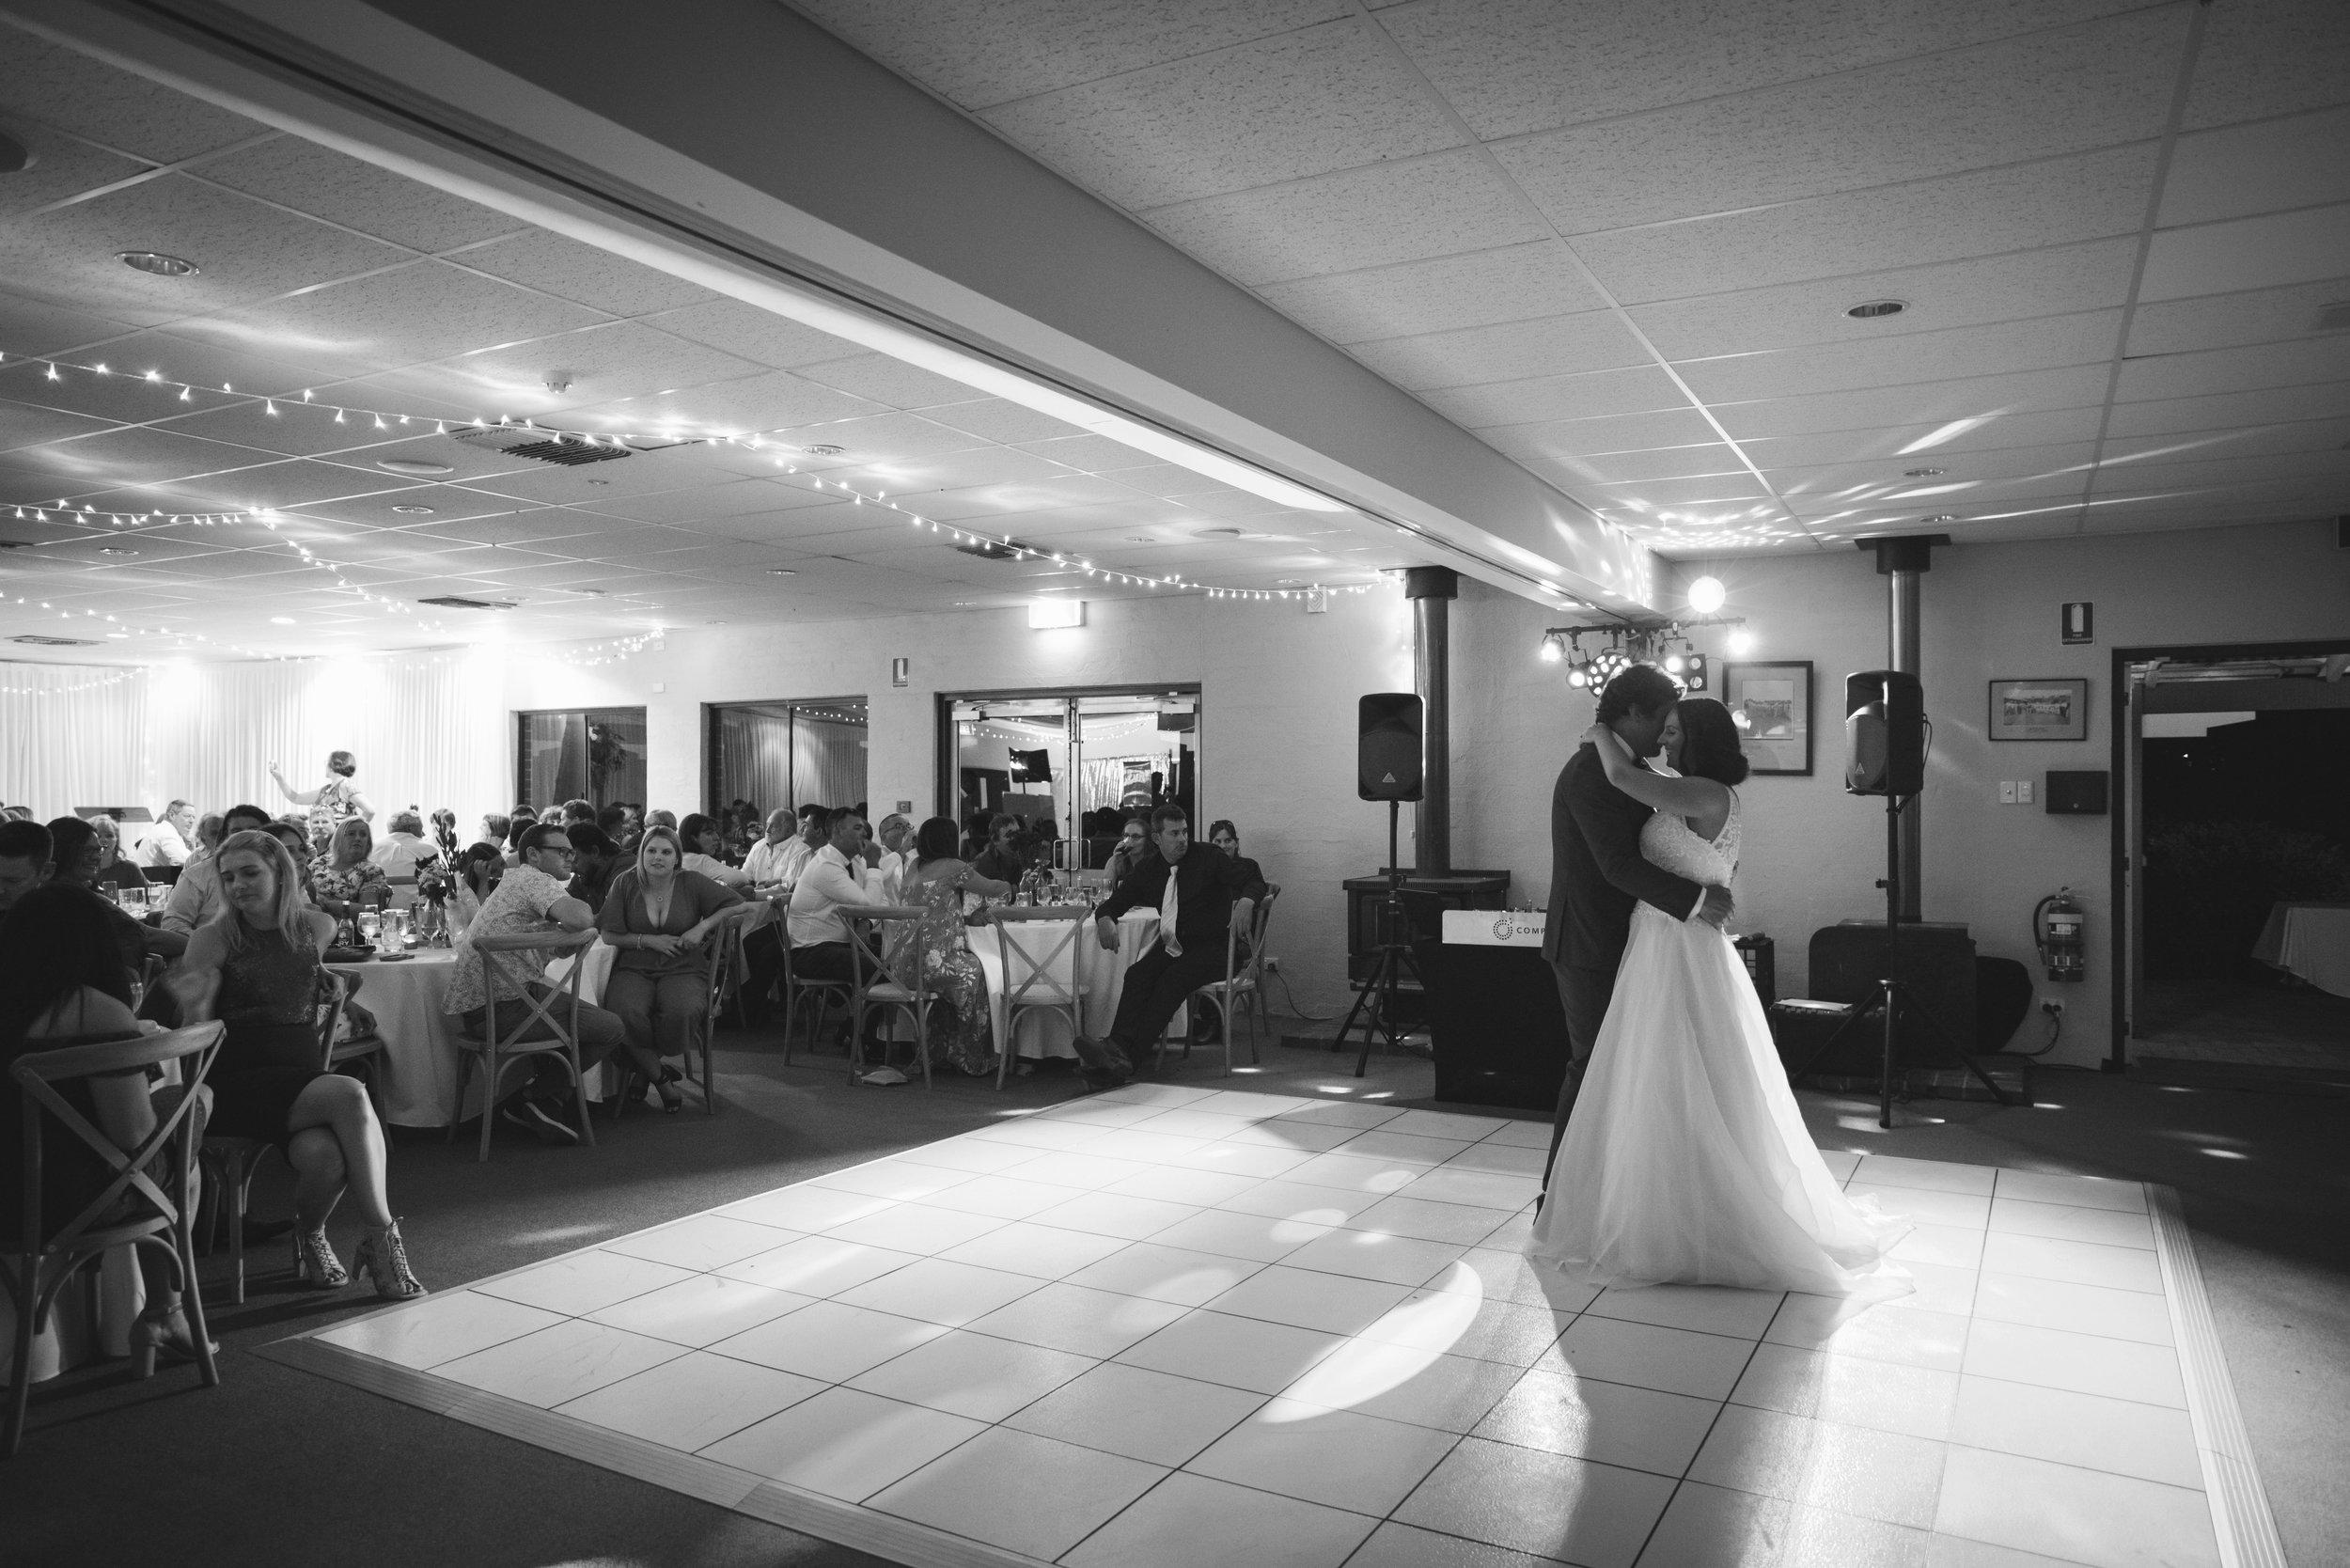 Angie Roe Photography Wheatbelt Avon Valley Farm Wedding (74).jpg